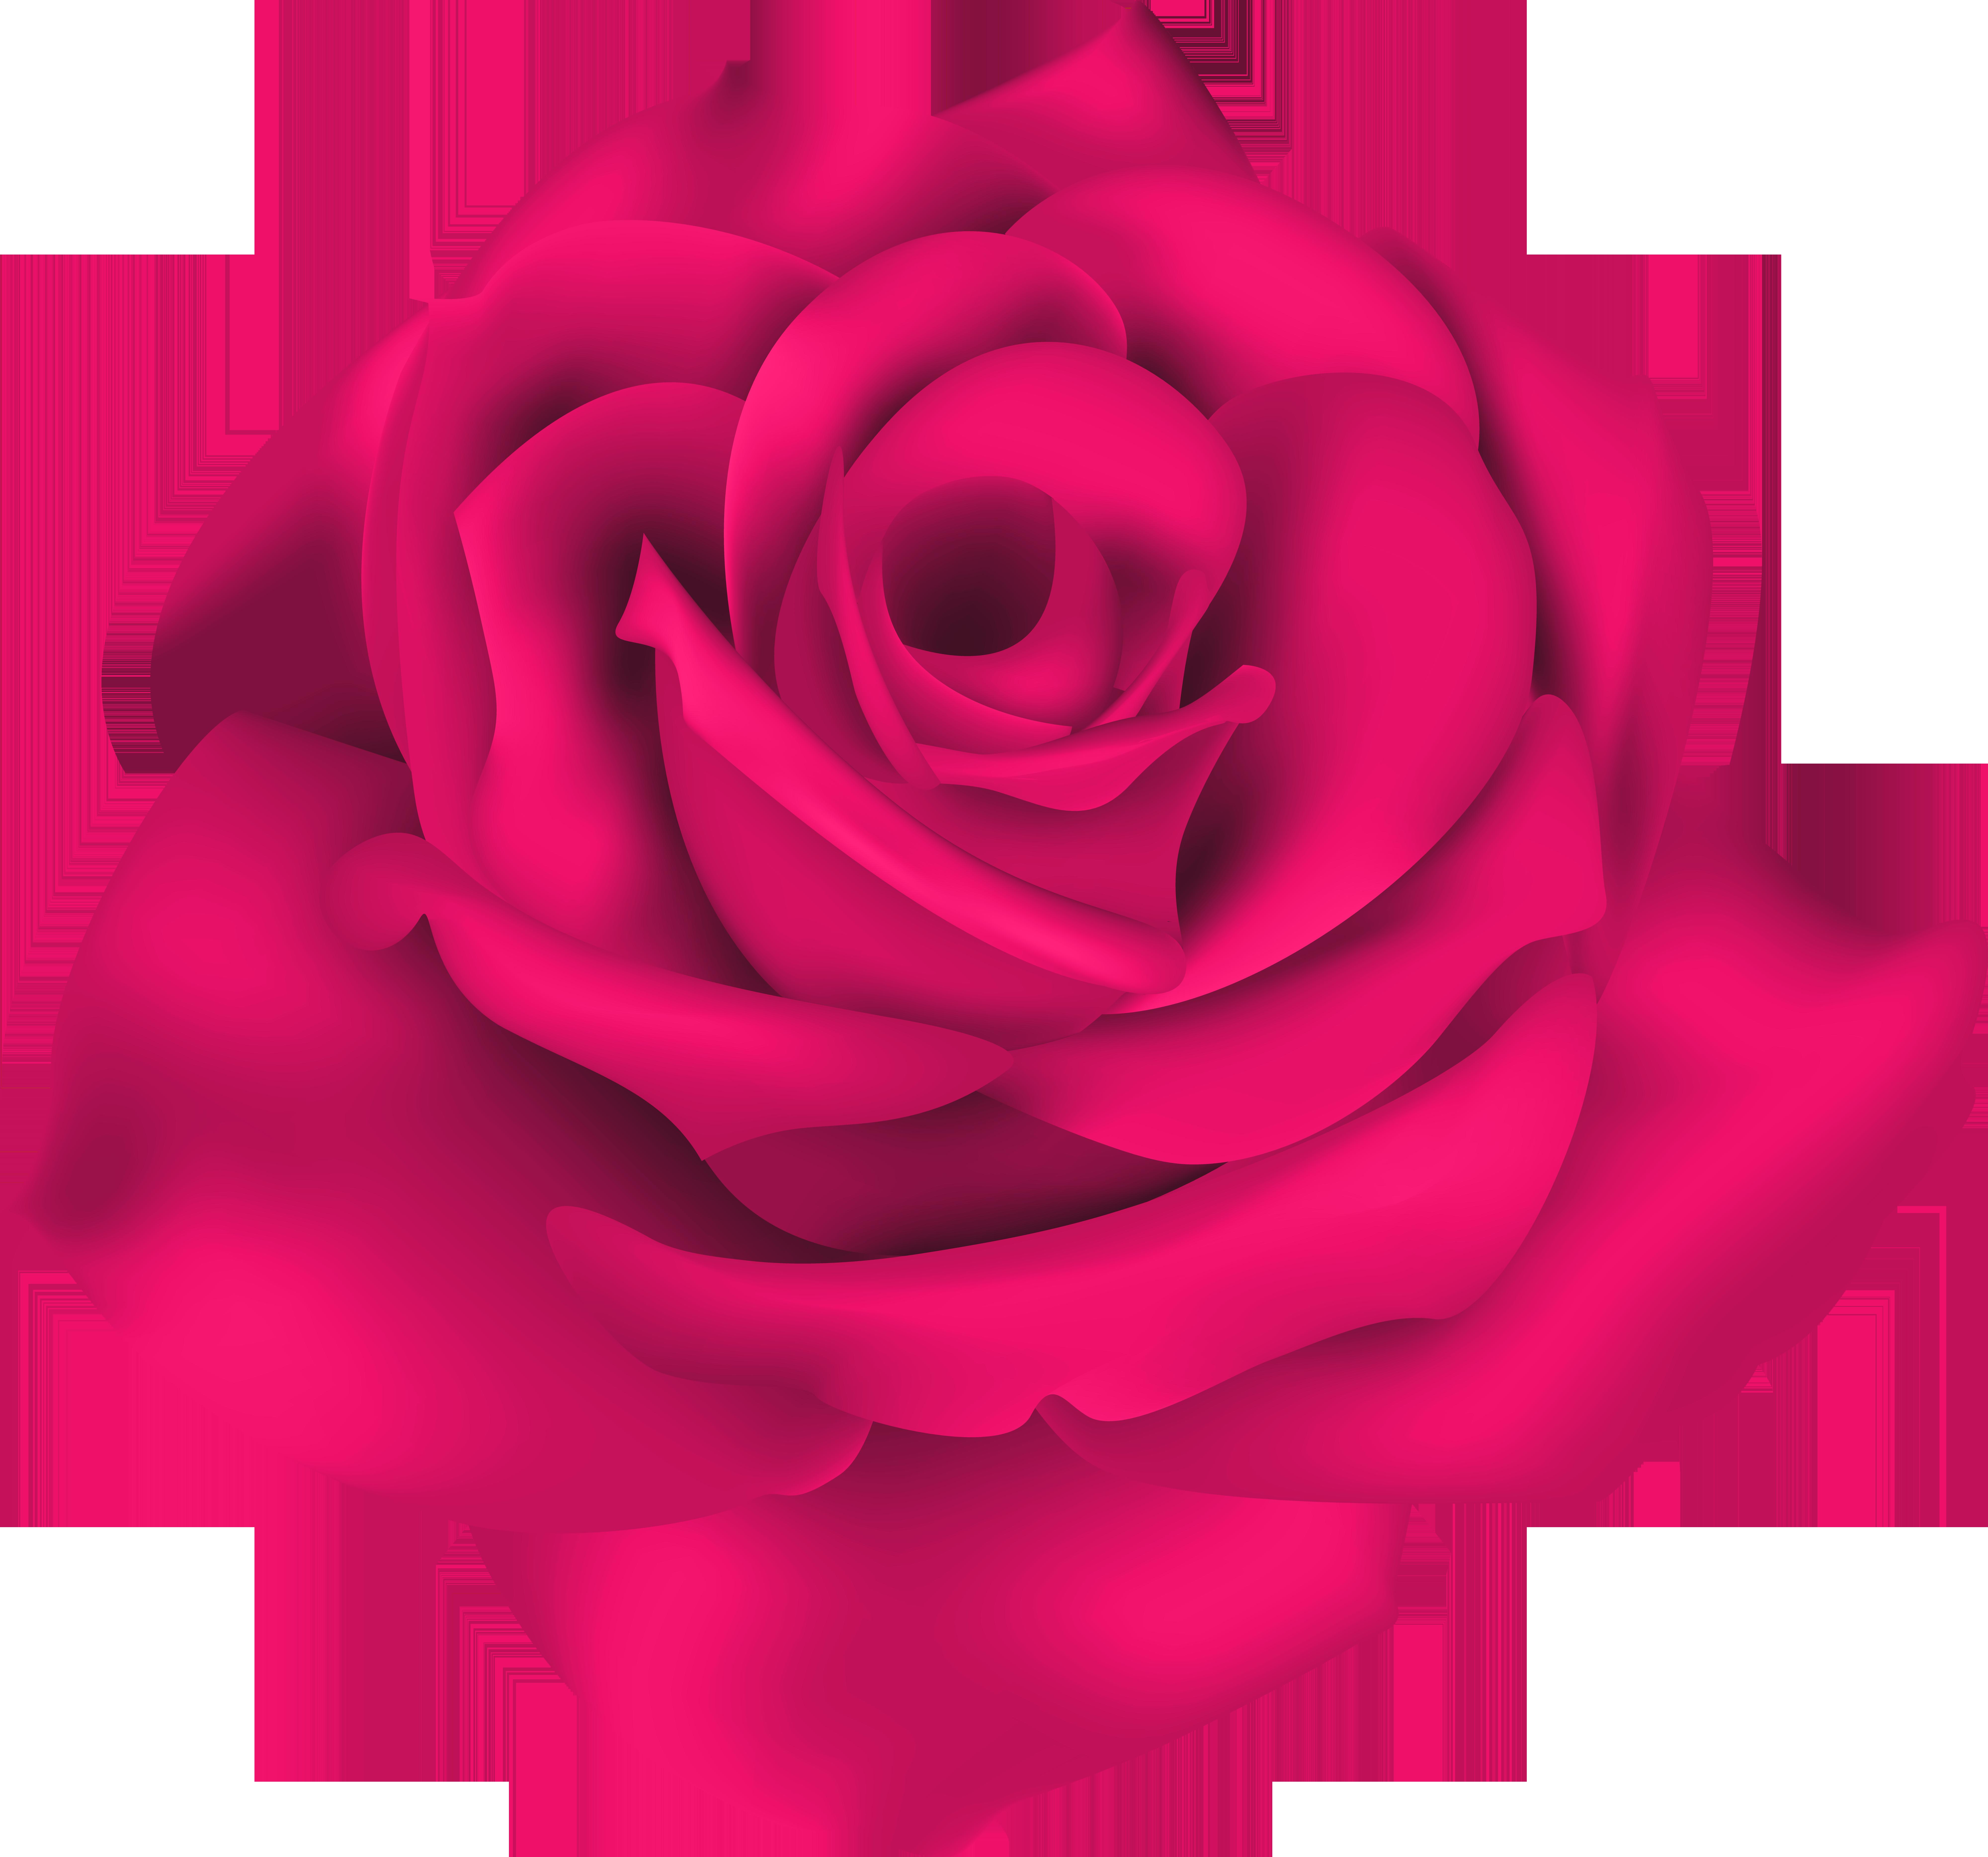 Single Pink Rose PNG Clip Art Image.